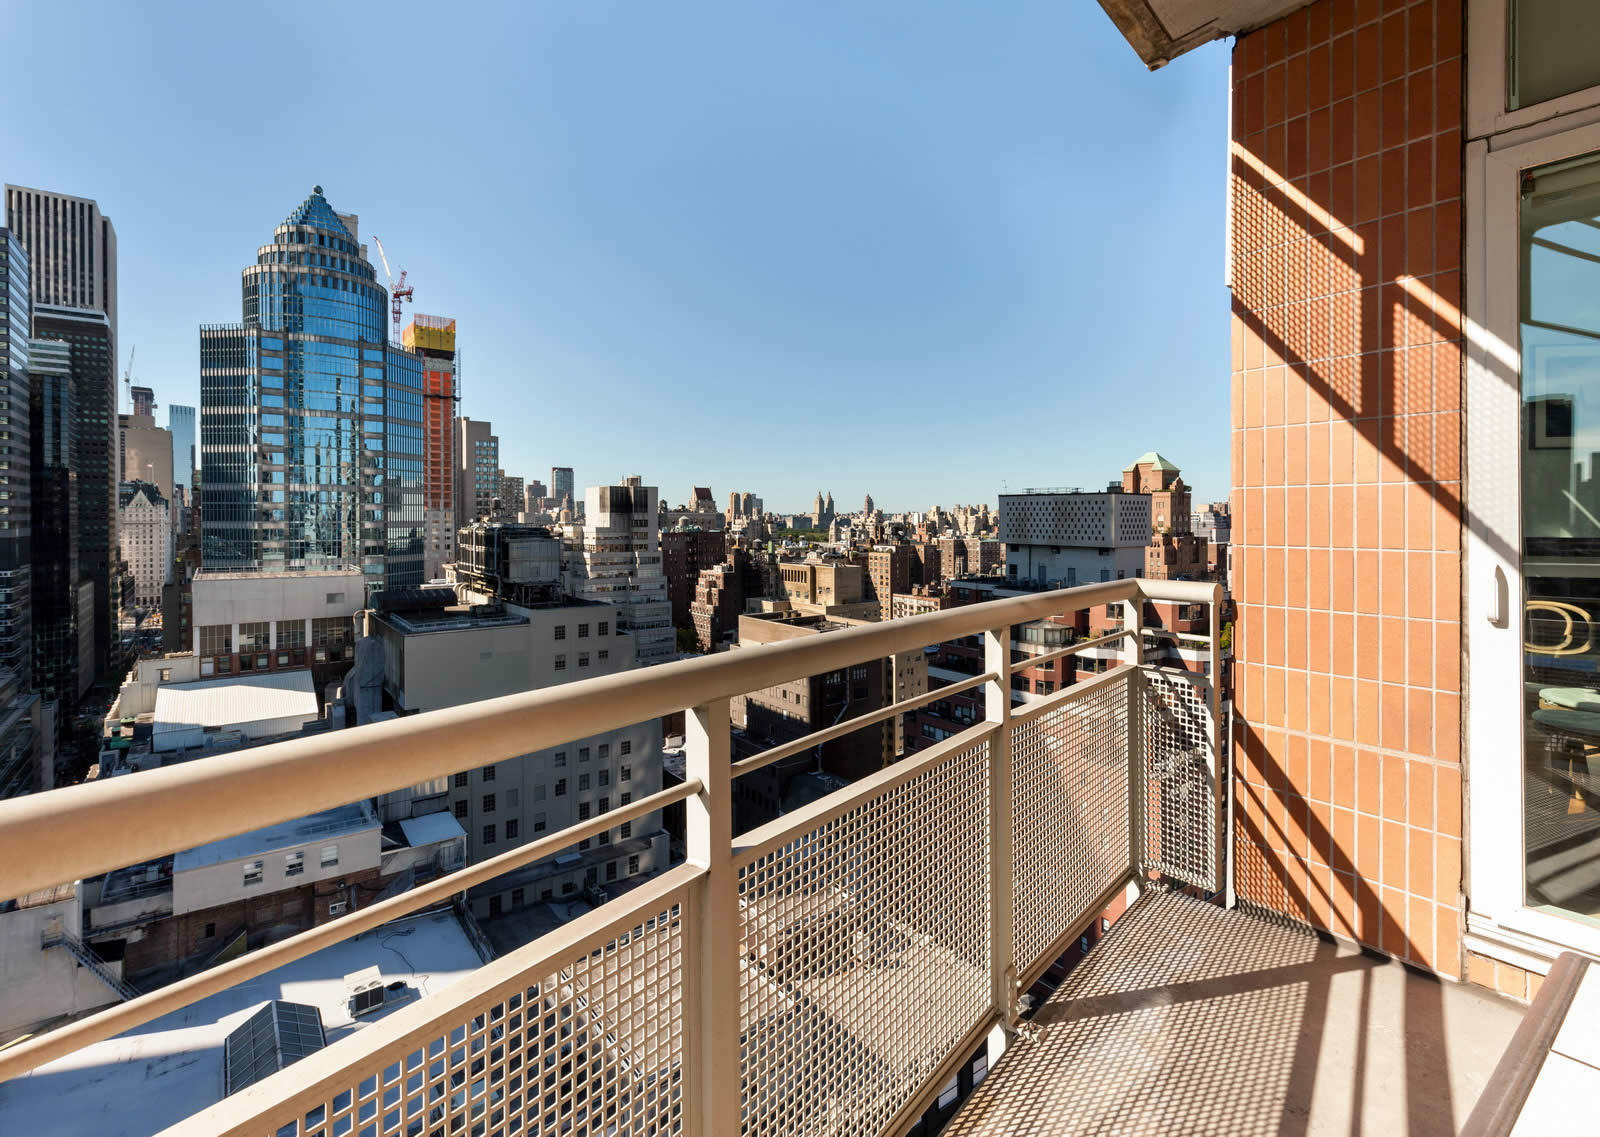 appartement avec grandes baies vitr es et terrasse vendre dans l 39 upper east side pr s de. Black Bedroom Furniture Sets. Home Design Ideas